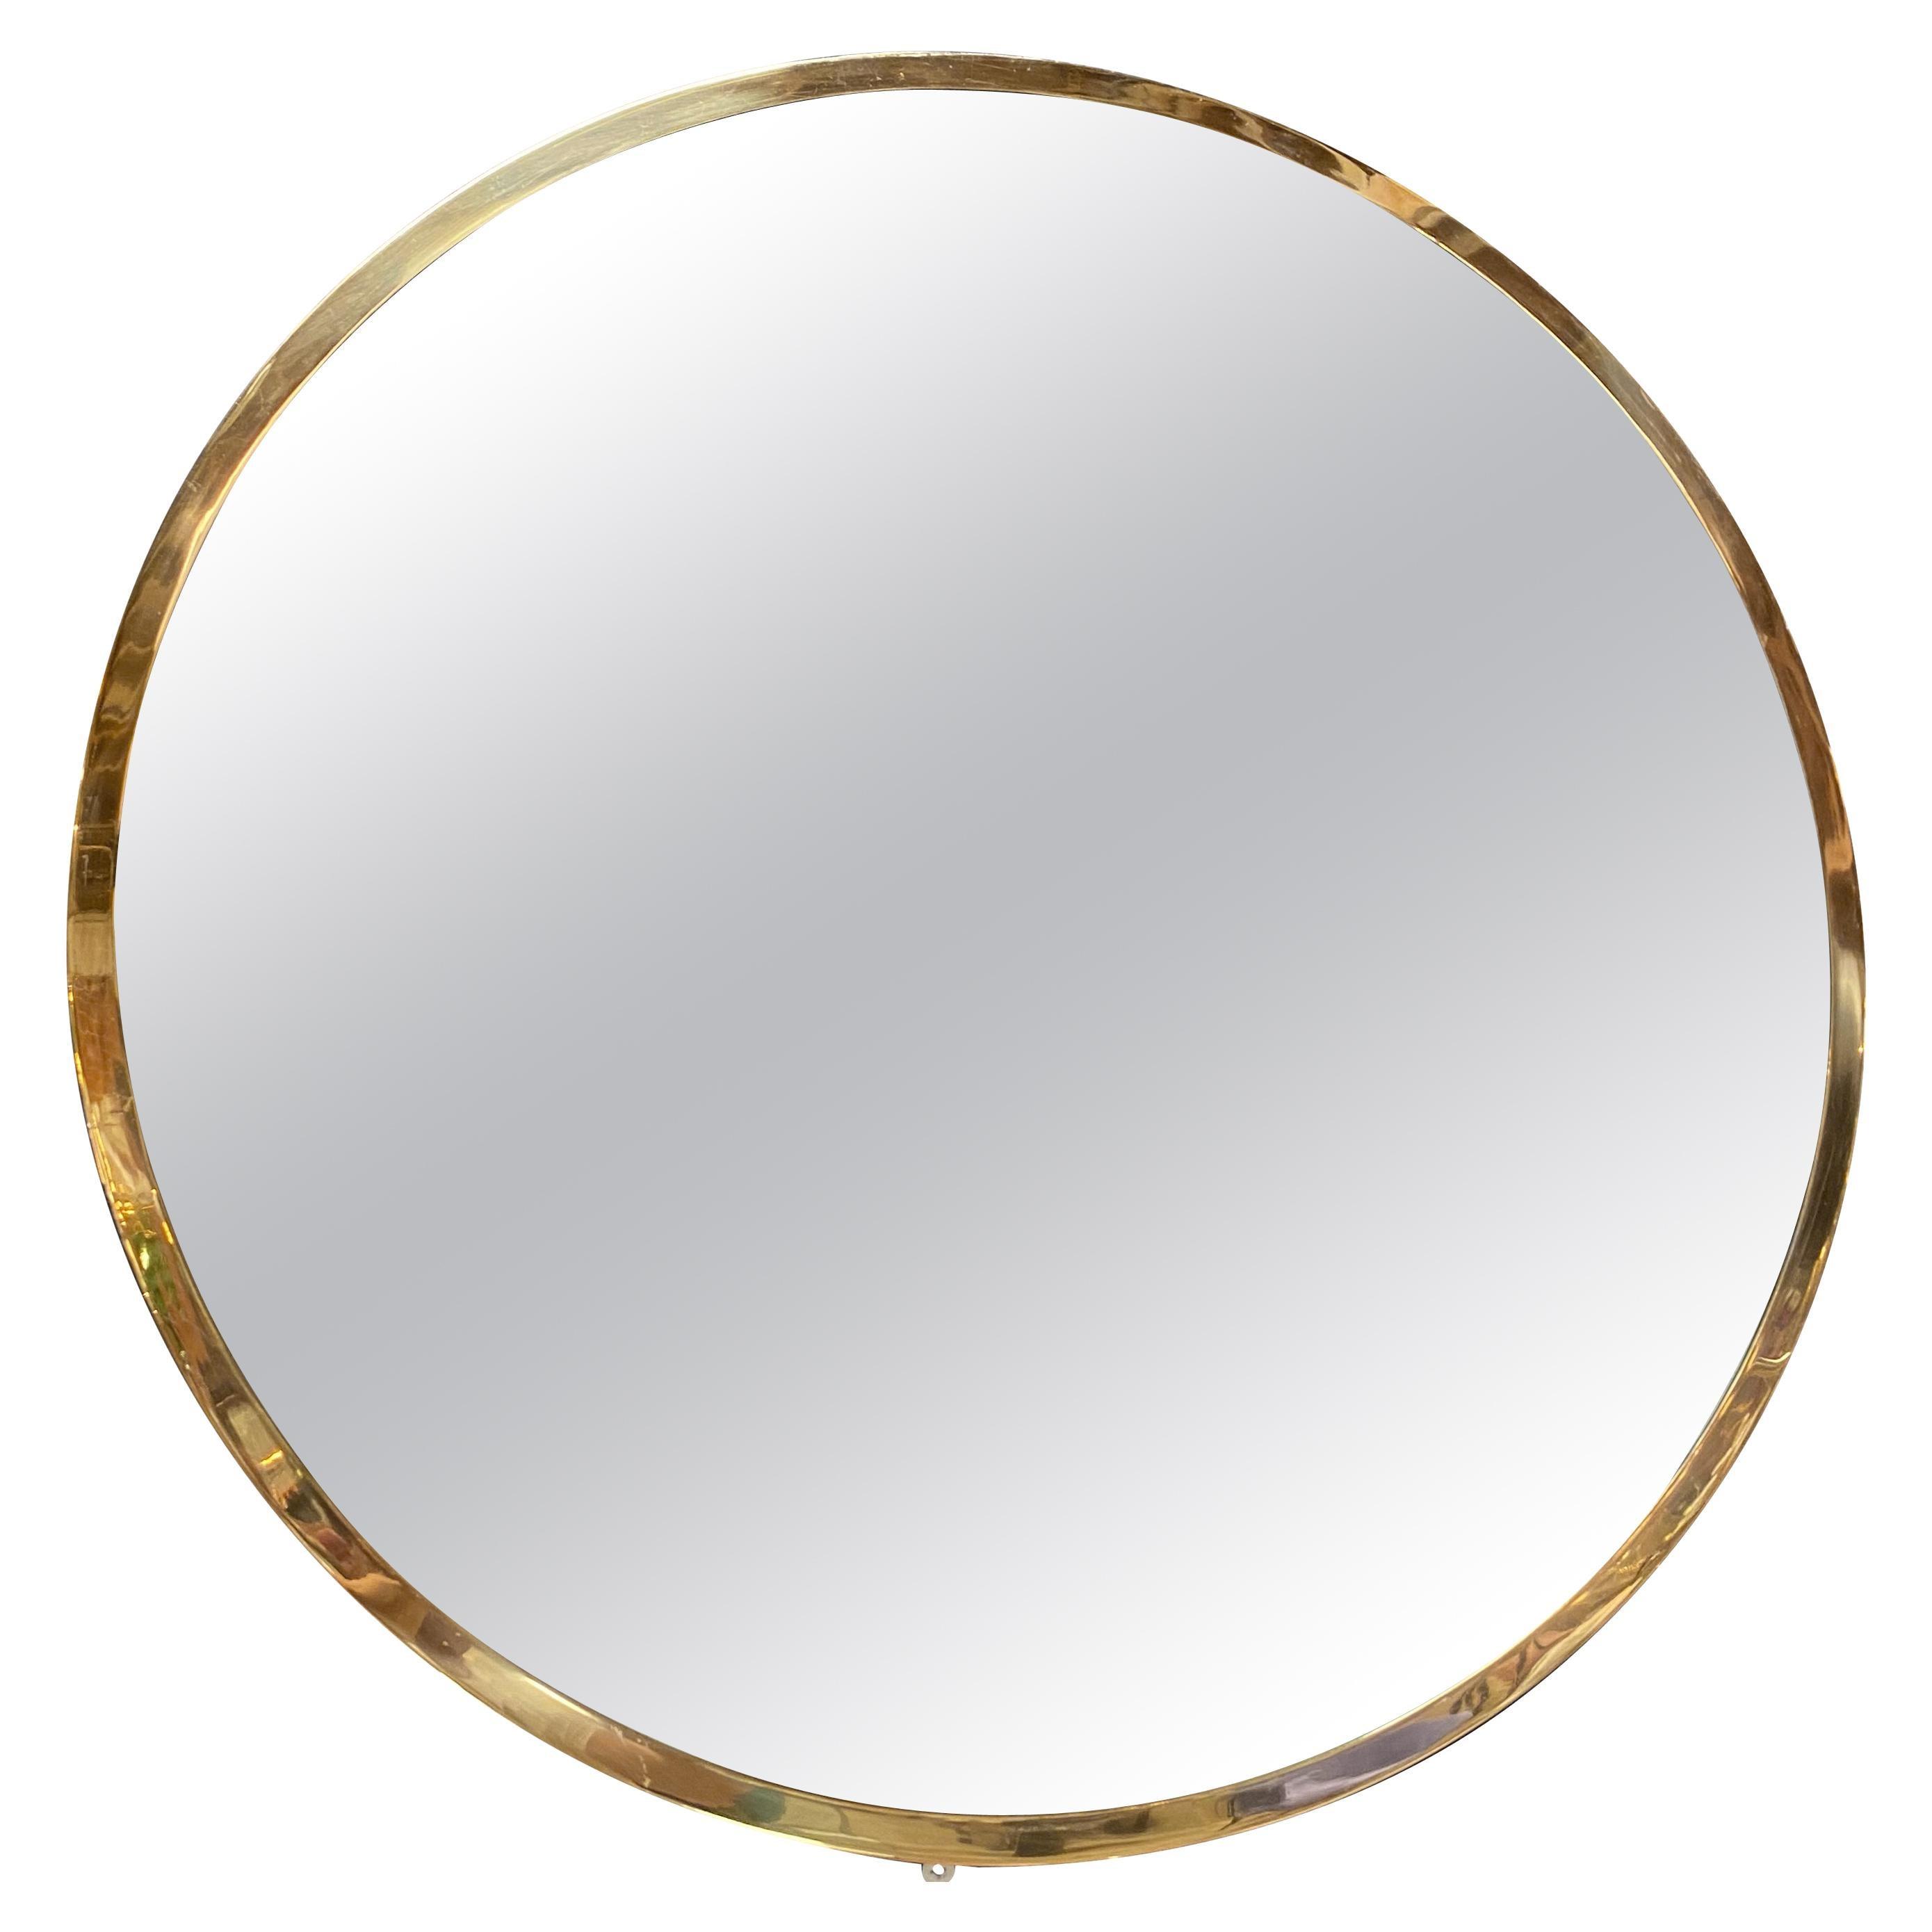 Midcentury Large Circular Brass Mirror, Italy, 1950s